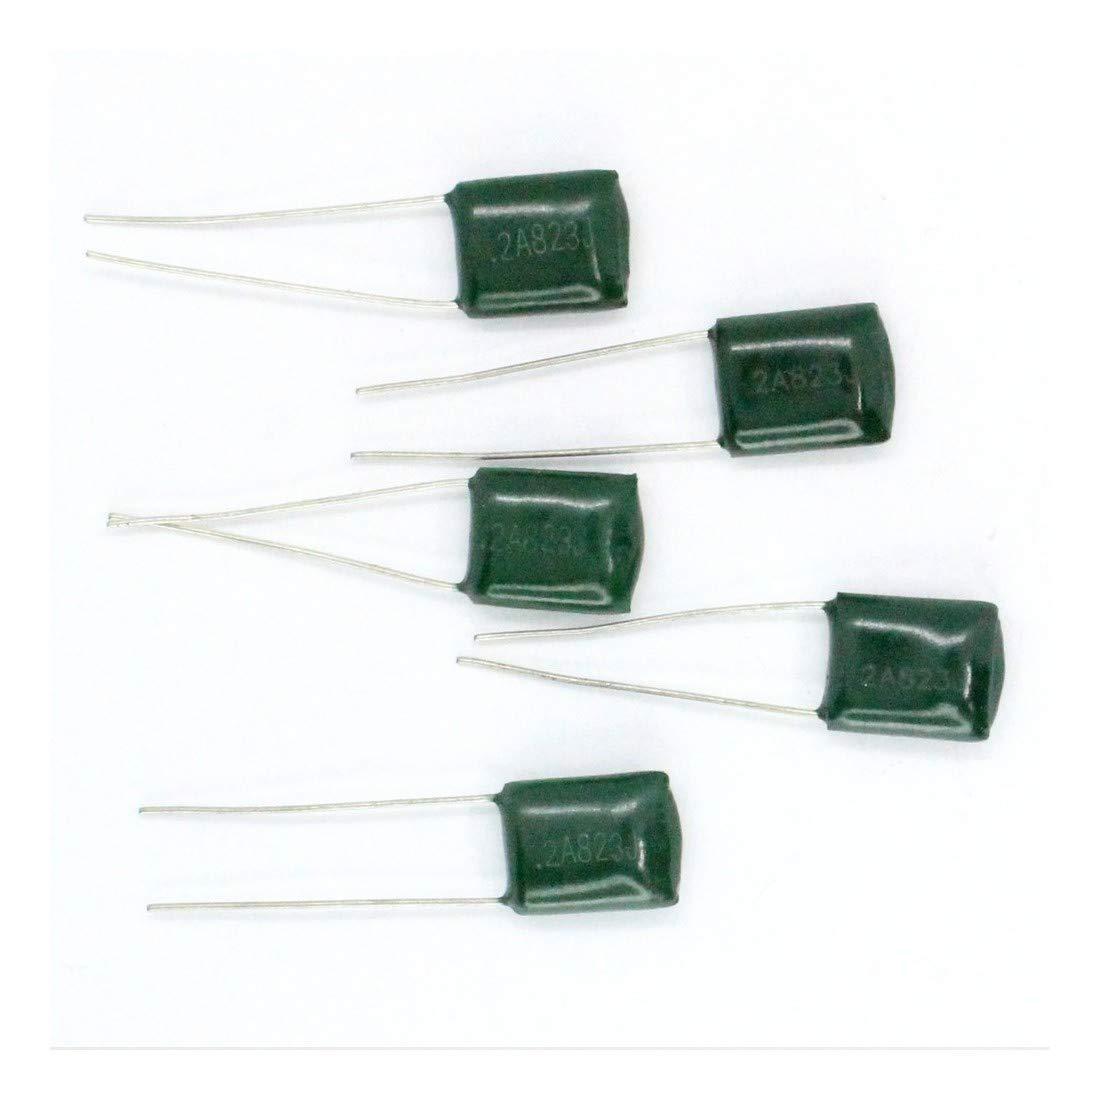 5x Condensateur Mylar 2A823-82nF 100v 14con098